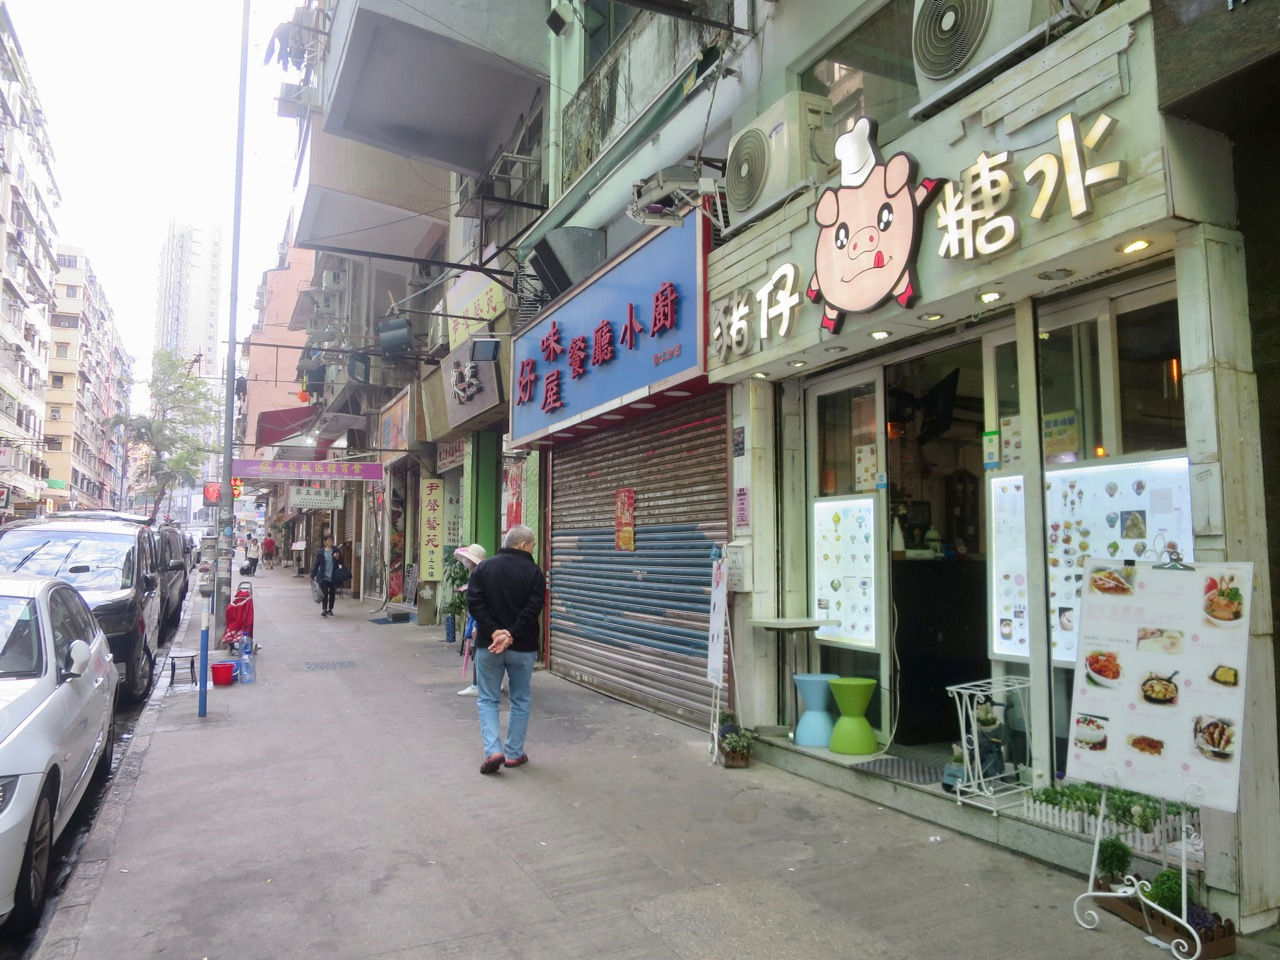 Hong Kong 6 12